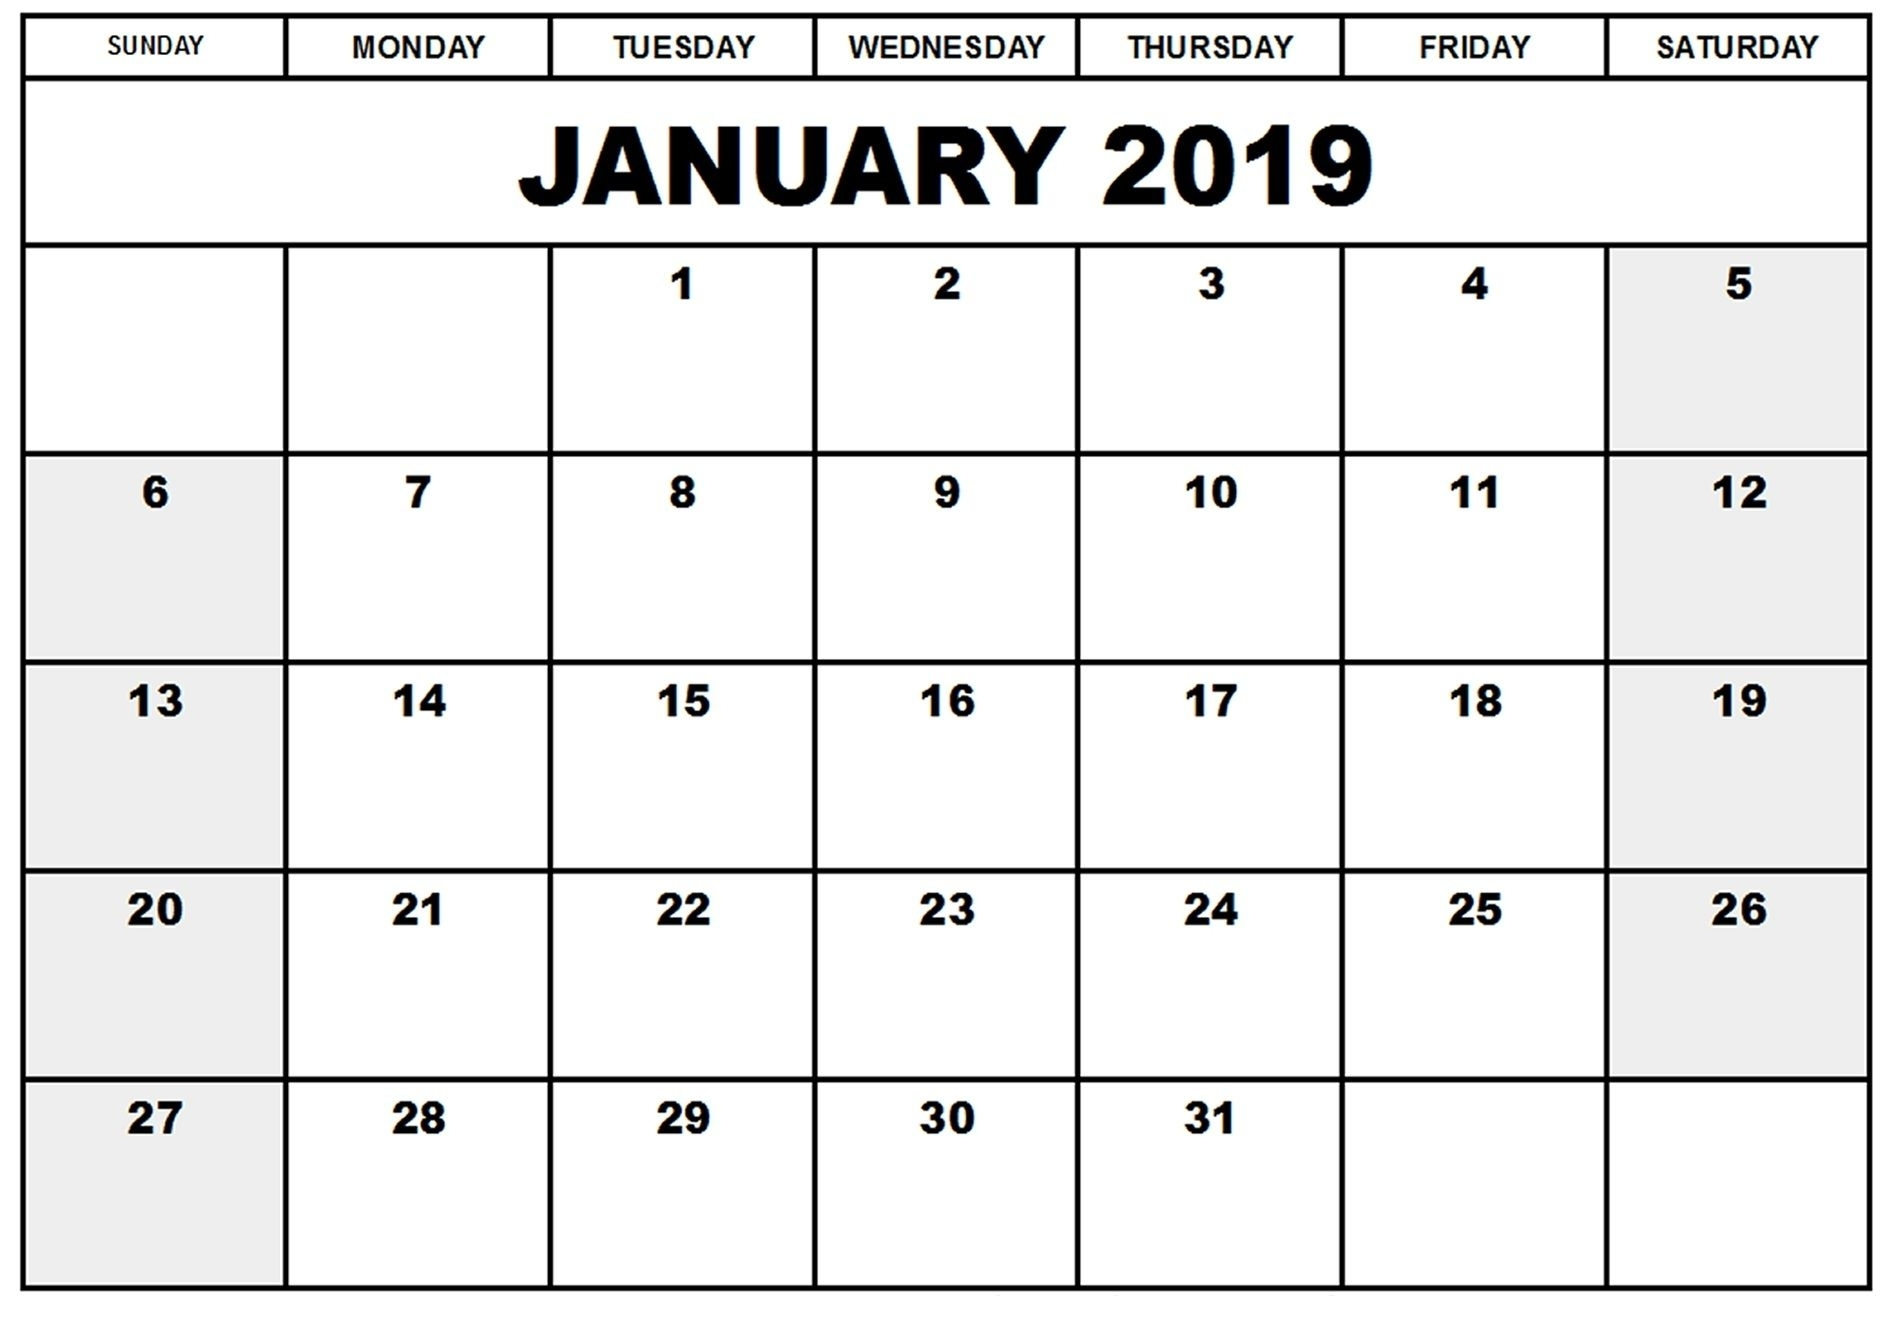 January 2019 Calendar Word #printable #calendar #calendar2019 with 12 Month Calendar Word Template